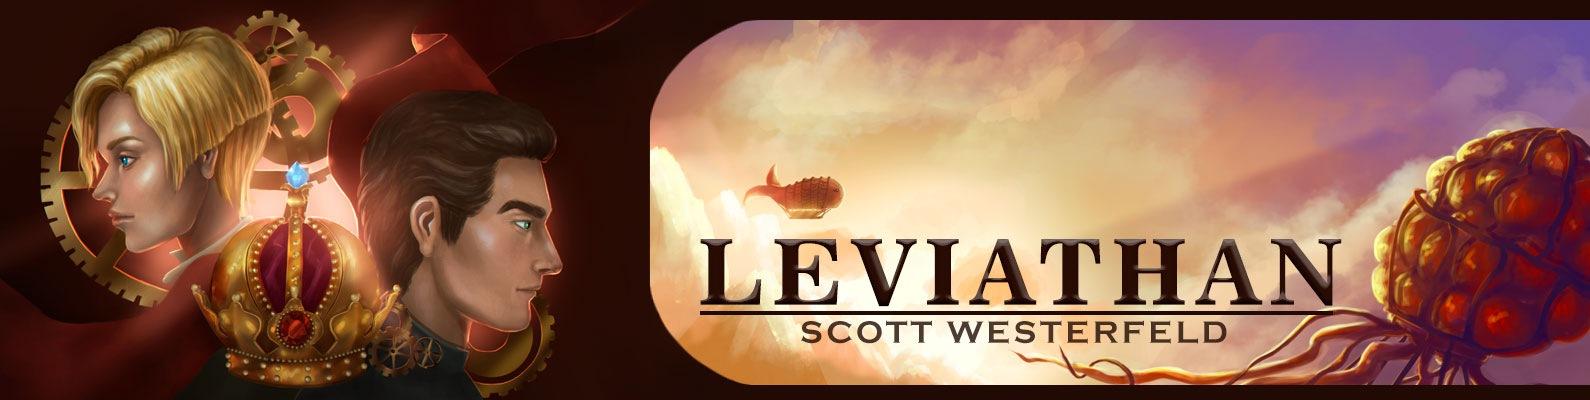 Scott Westerfeld Goliath Ebook